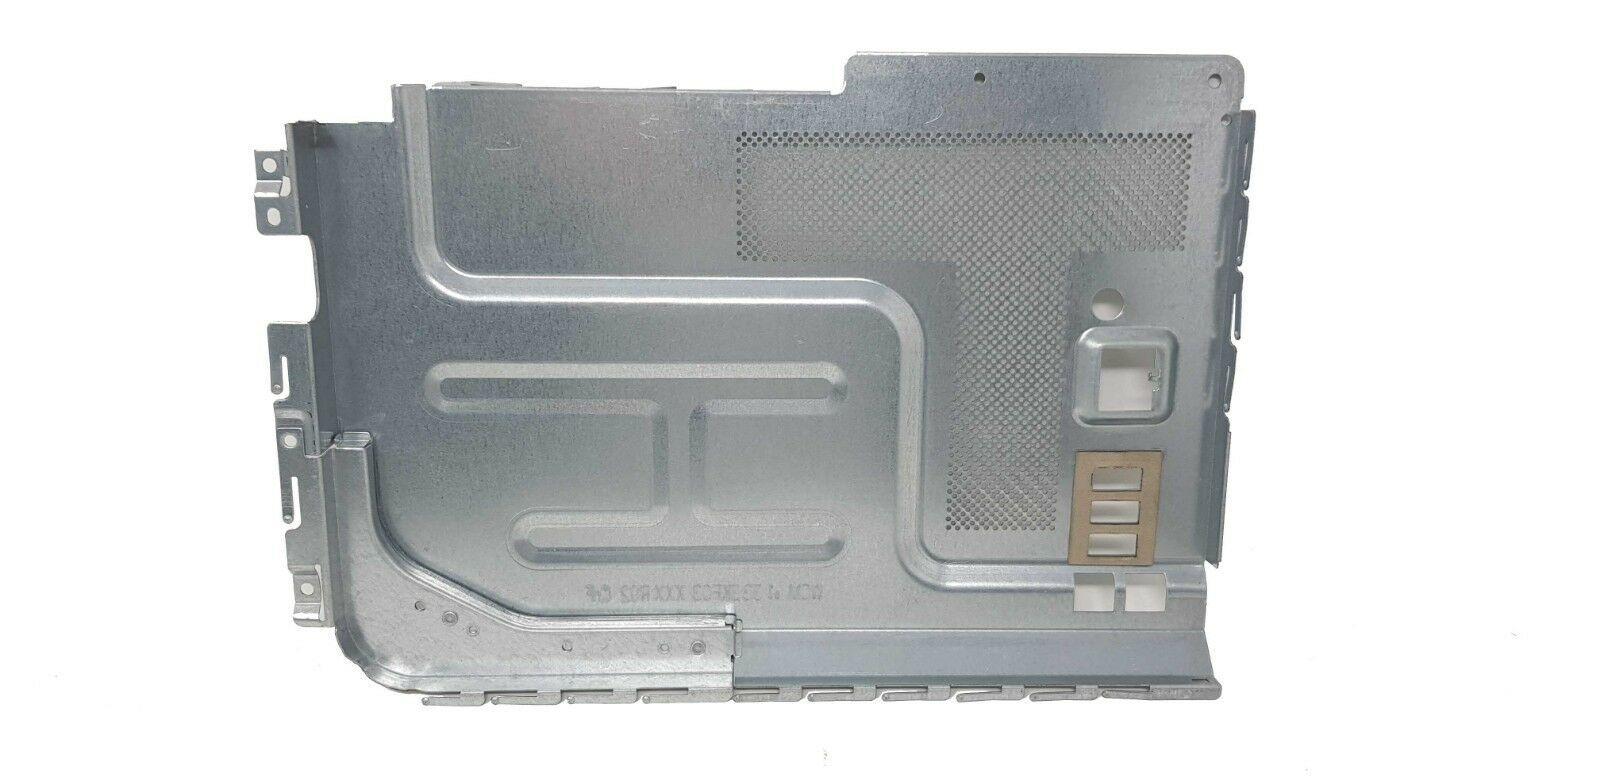 Original Motherboard Shield Replacement ZX4665G-UW31 For Gateway 60.3KF10.002 - $22.99